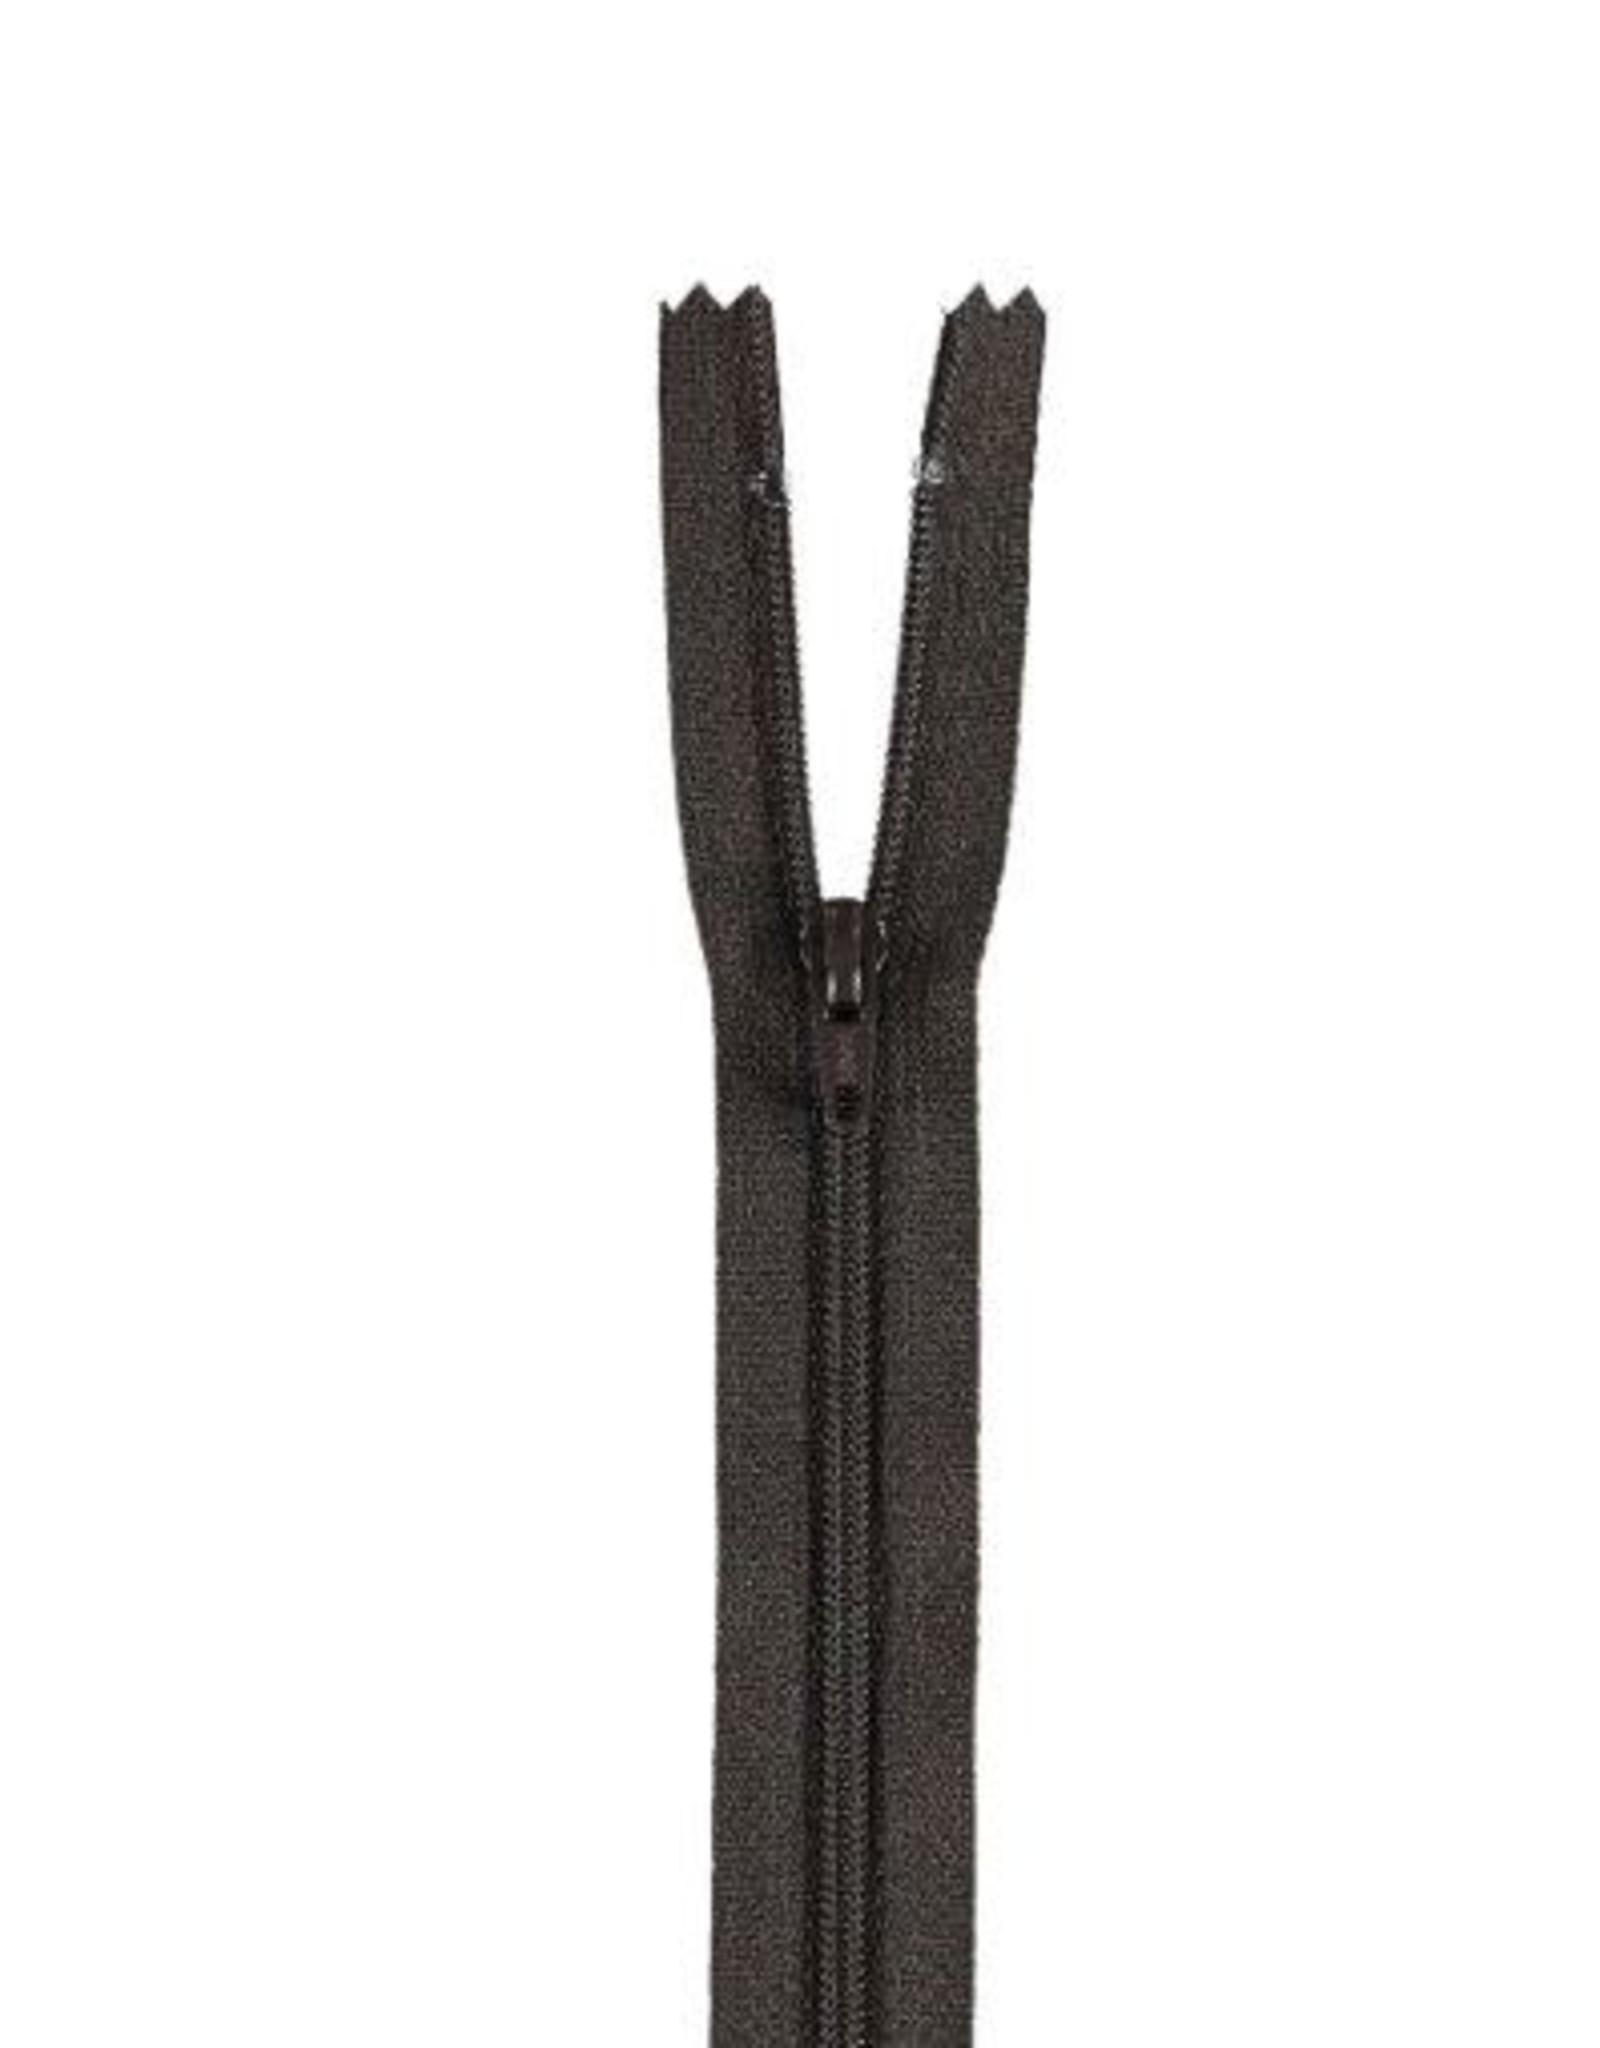 YKK Spiraalrits niet-DB 3mm zwart bruin 916-18cm